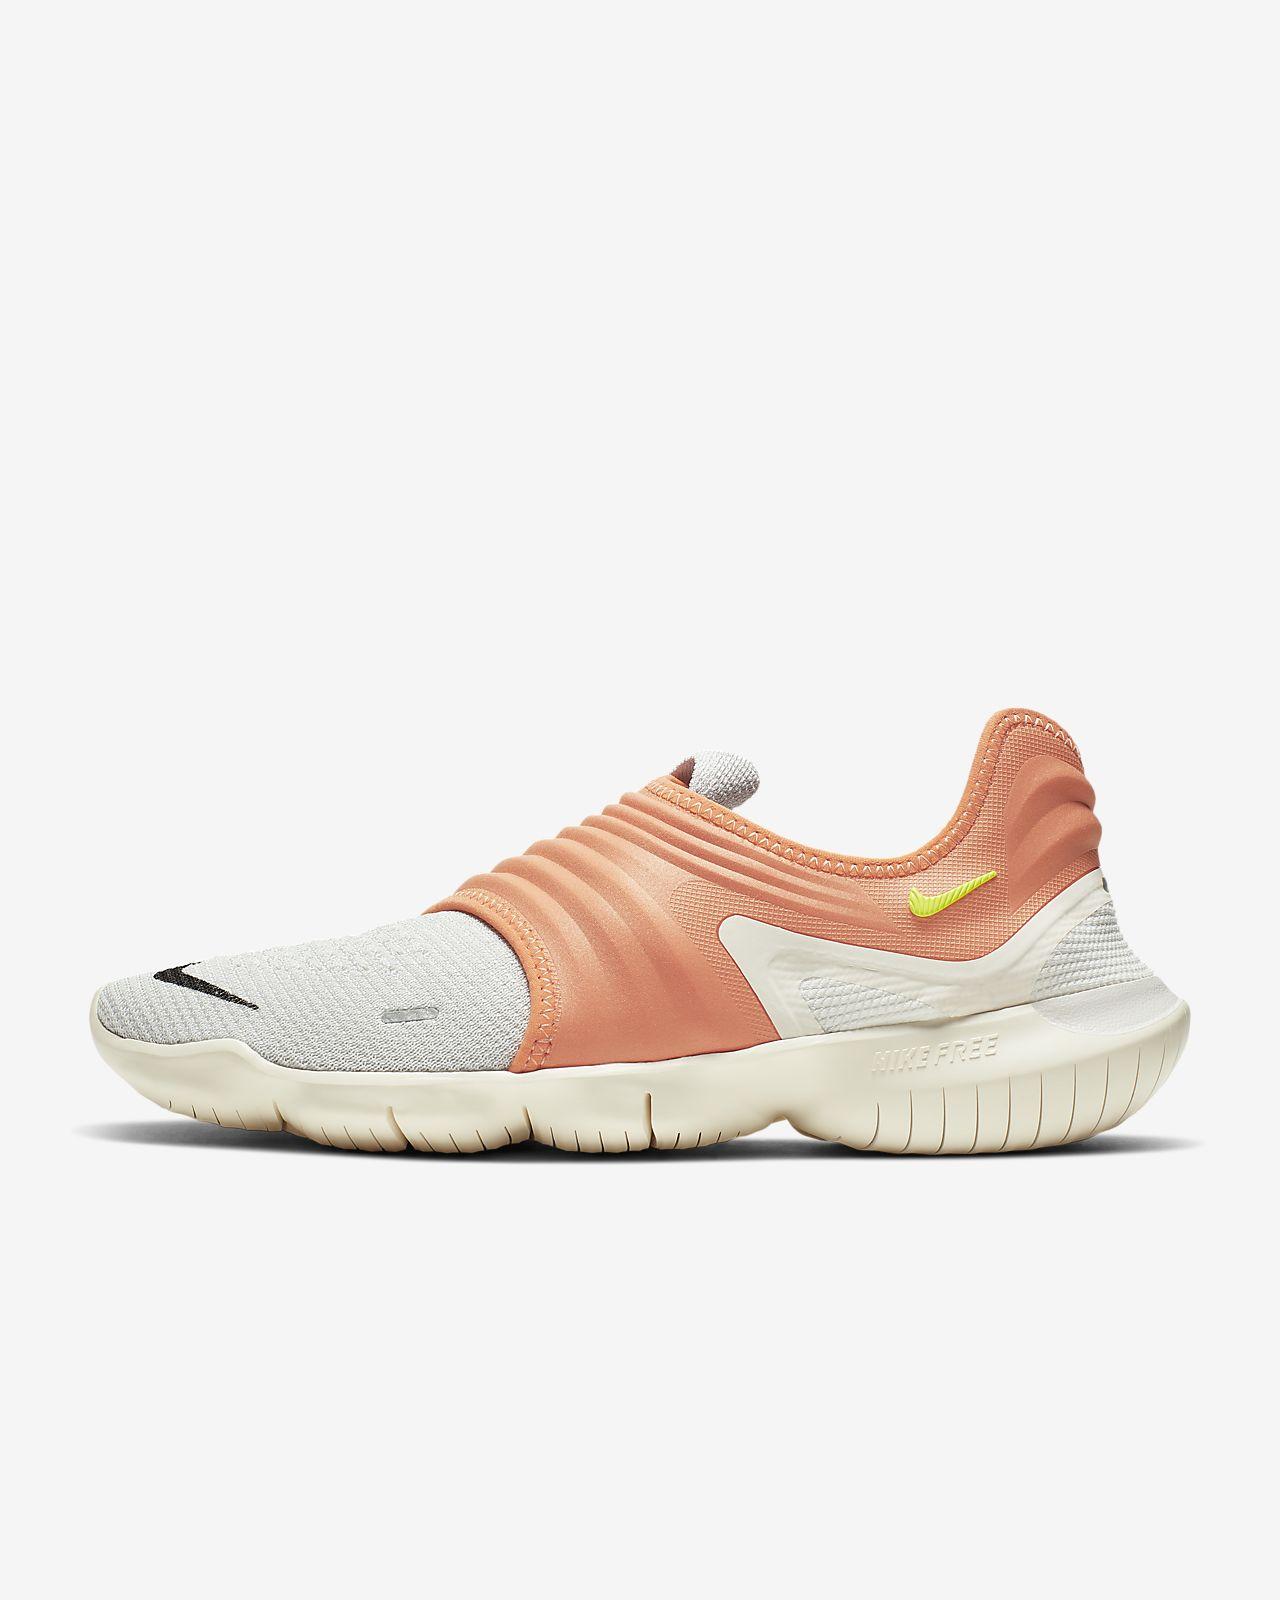 chaussures de running nike free rn flyknit